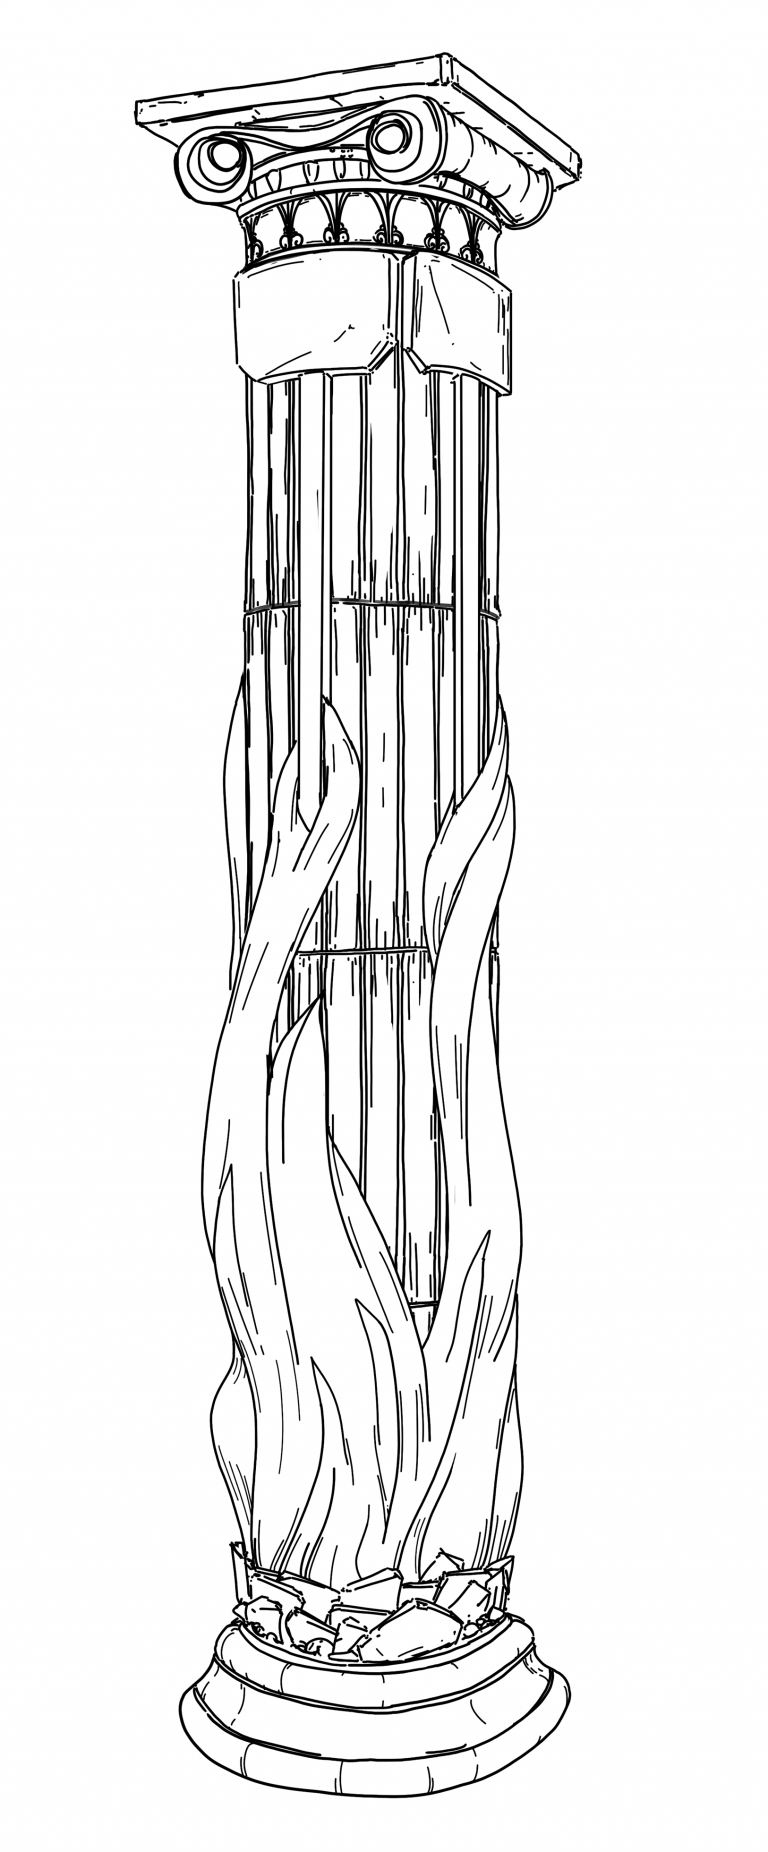 The Column of Hepheastus